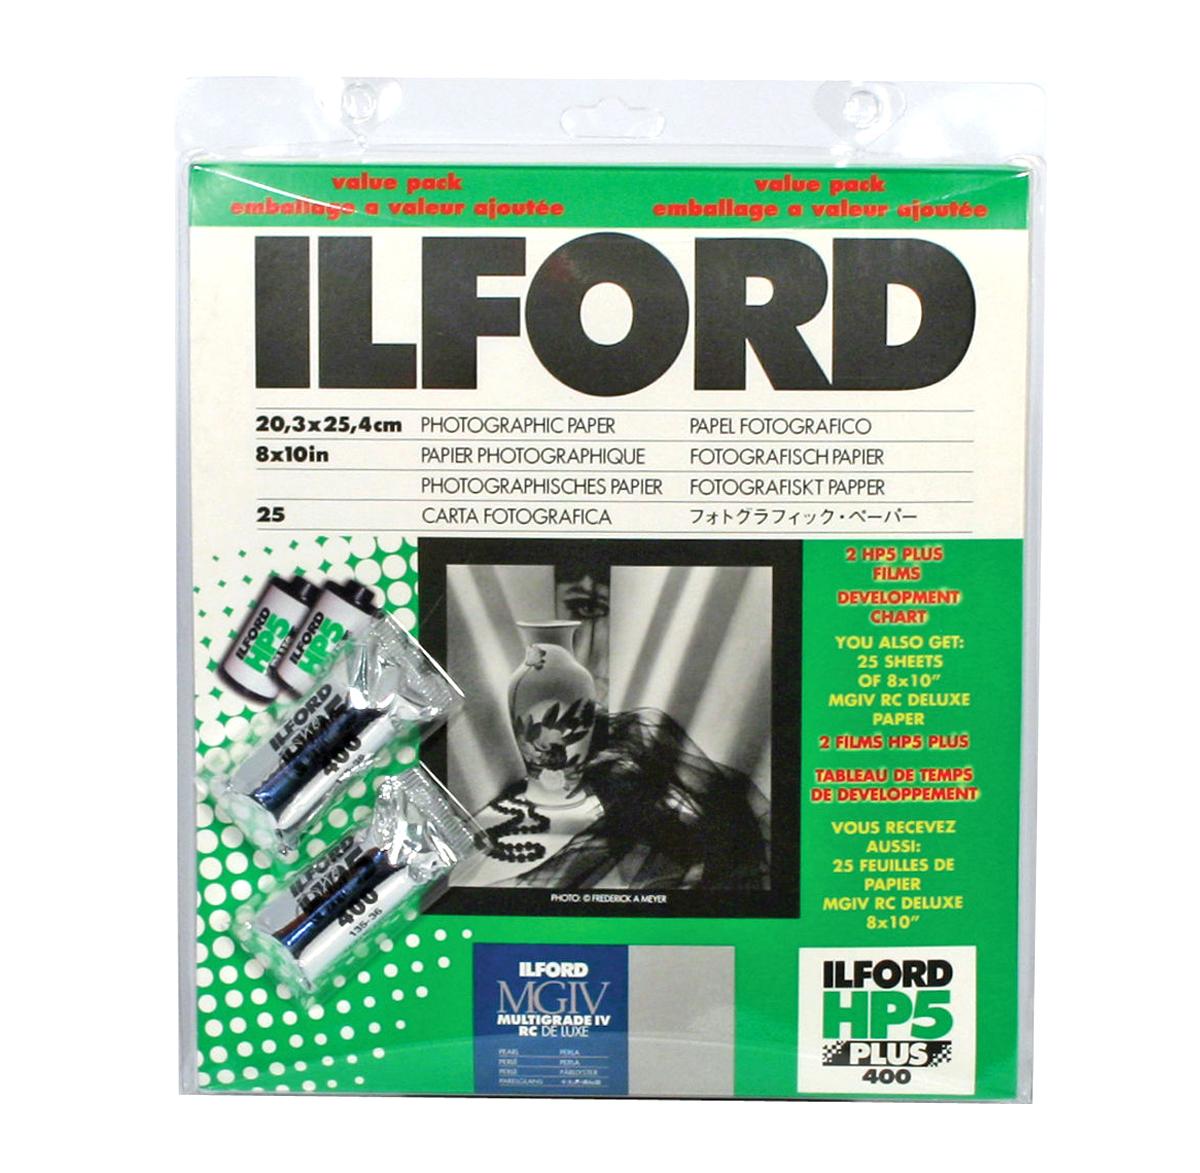 8 x 10in Multigrade IV B&W RC Pearl Paper (25 Sheets) w/2 Rolls of Film